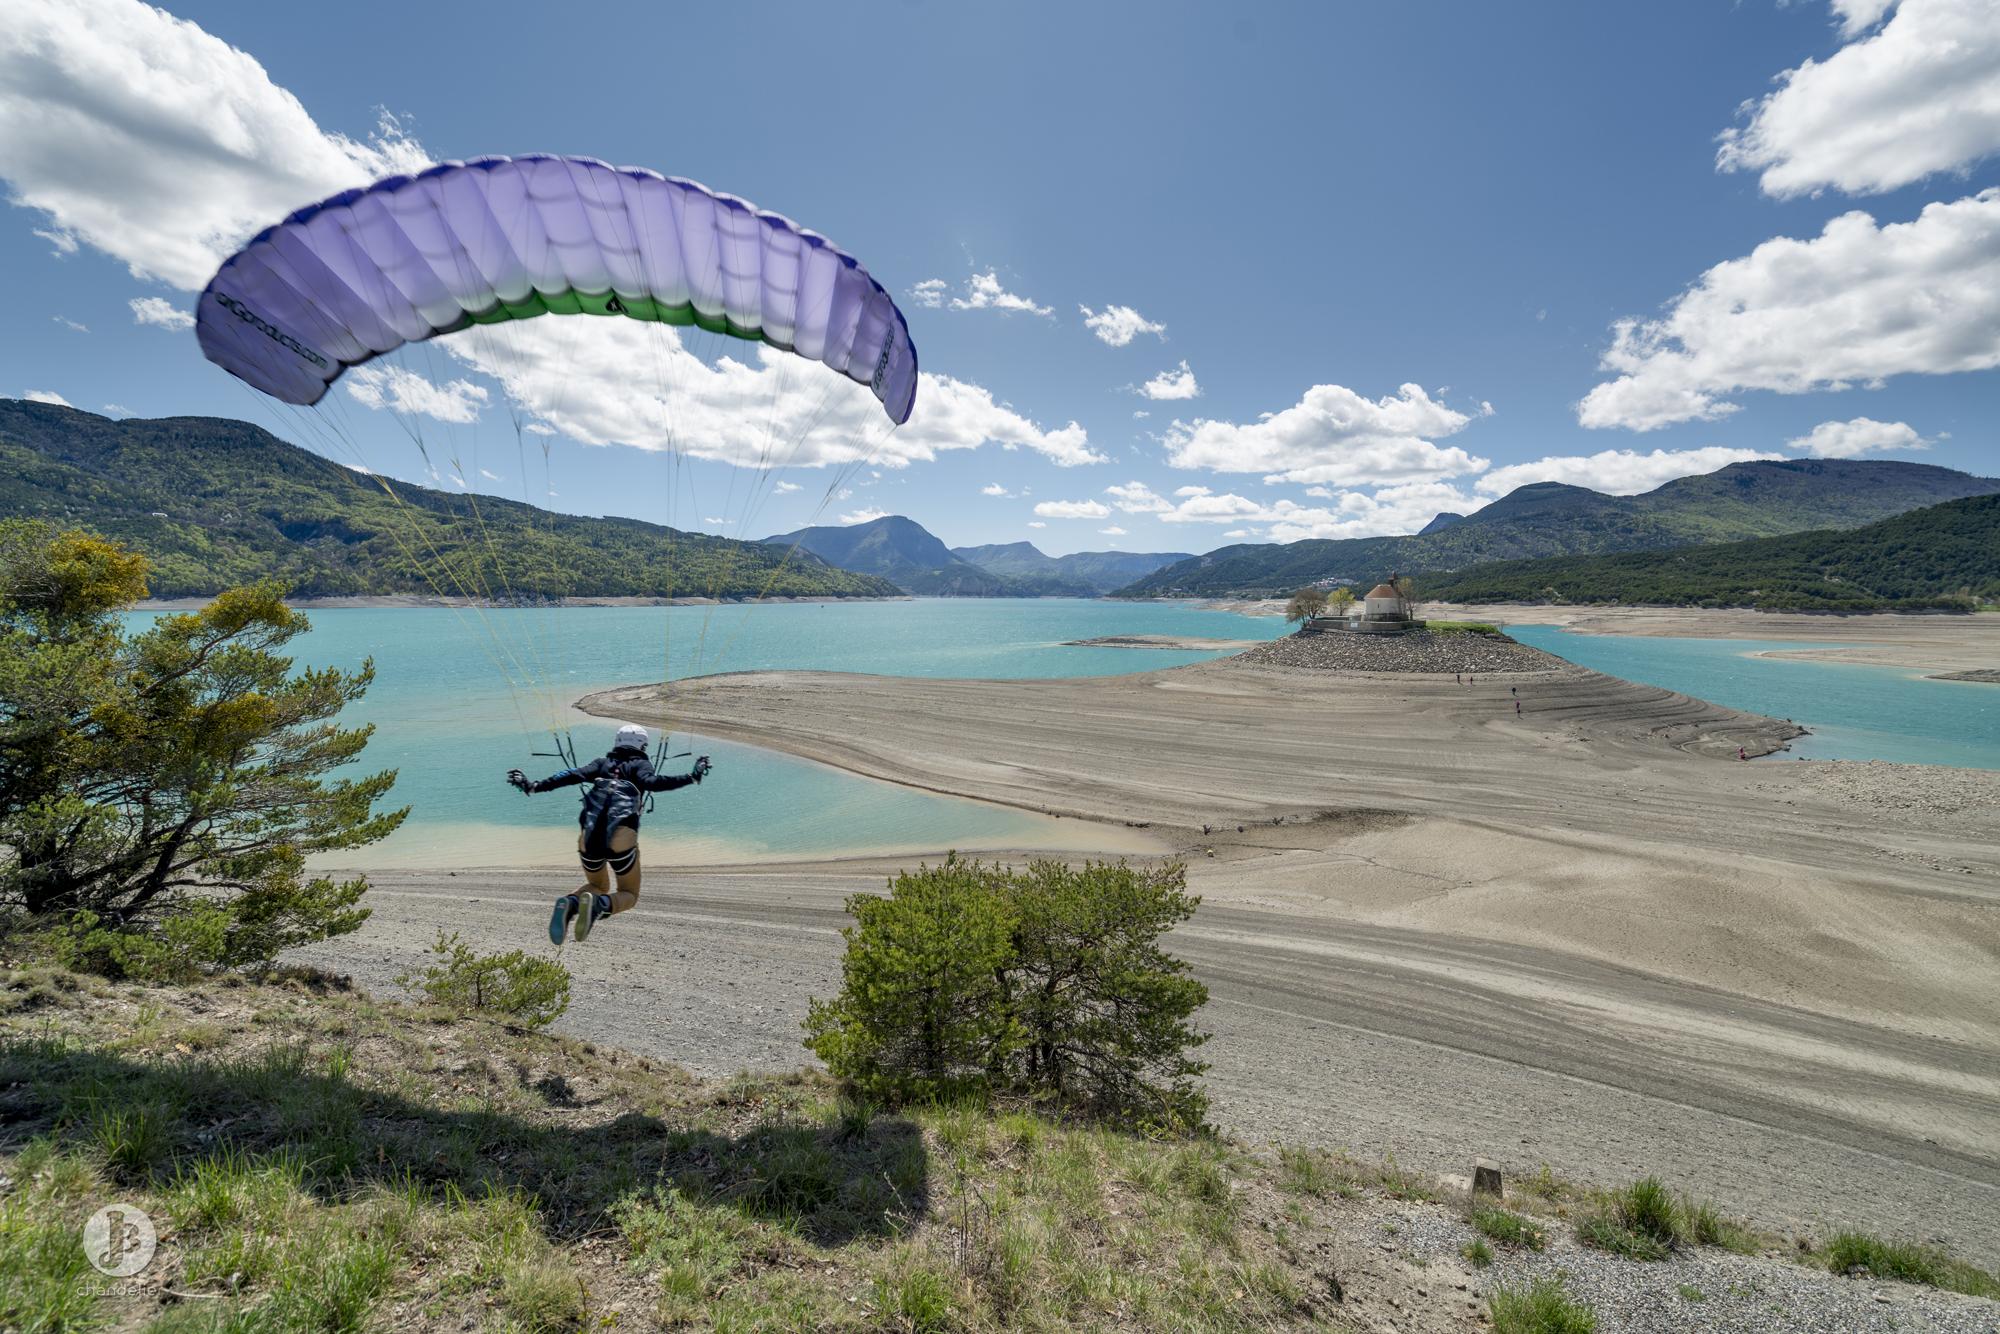 AirG Products Serre poncon parapente paraglide Francois Ragolski photo by Jean batiste Chandelier